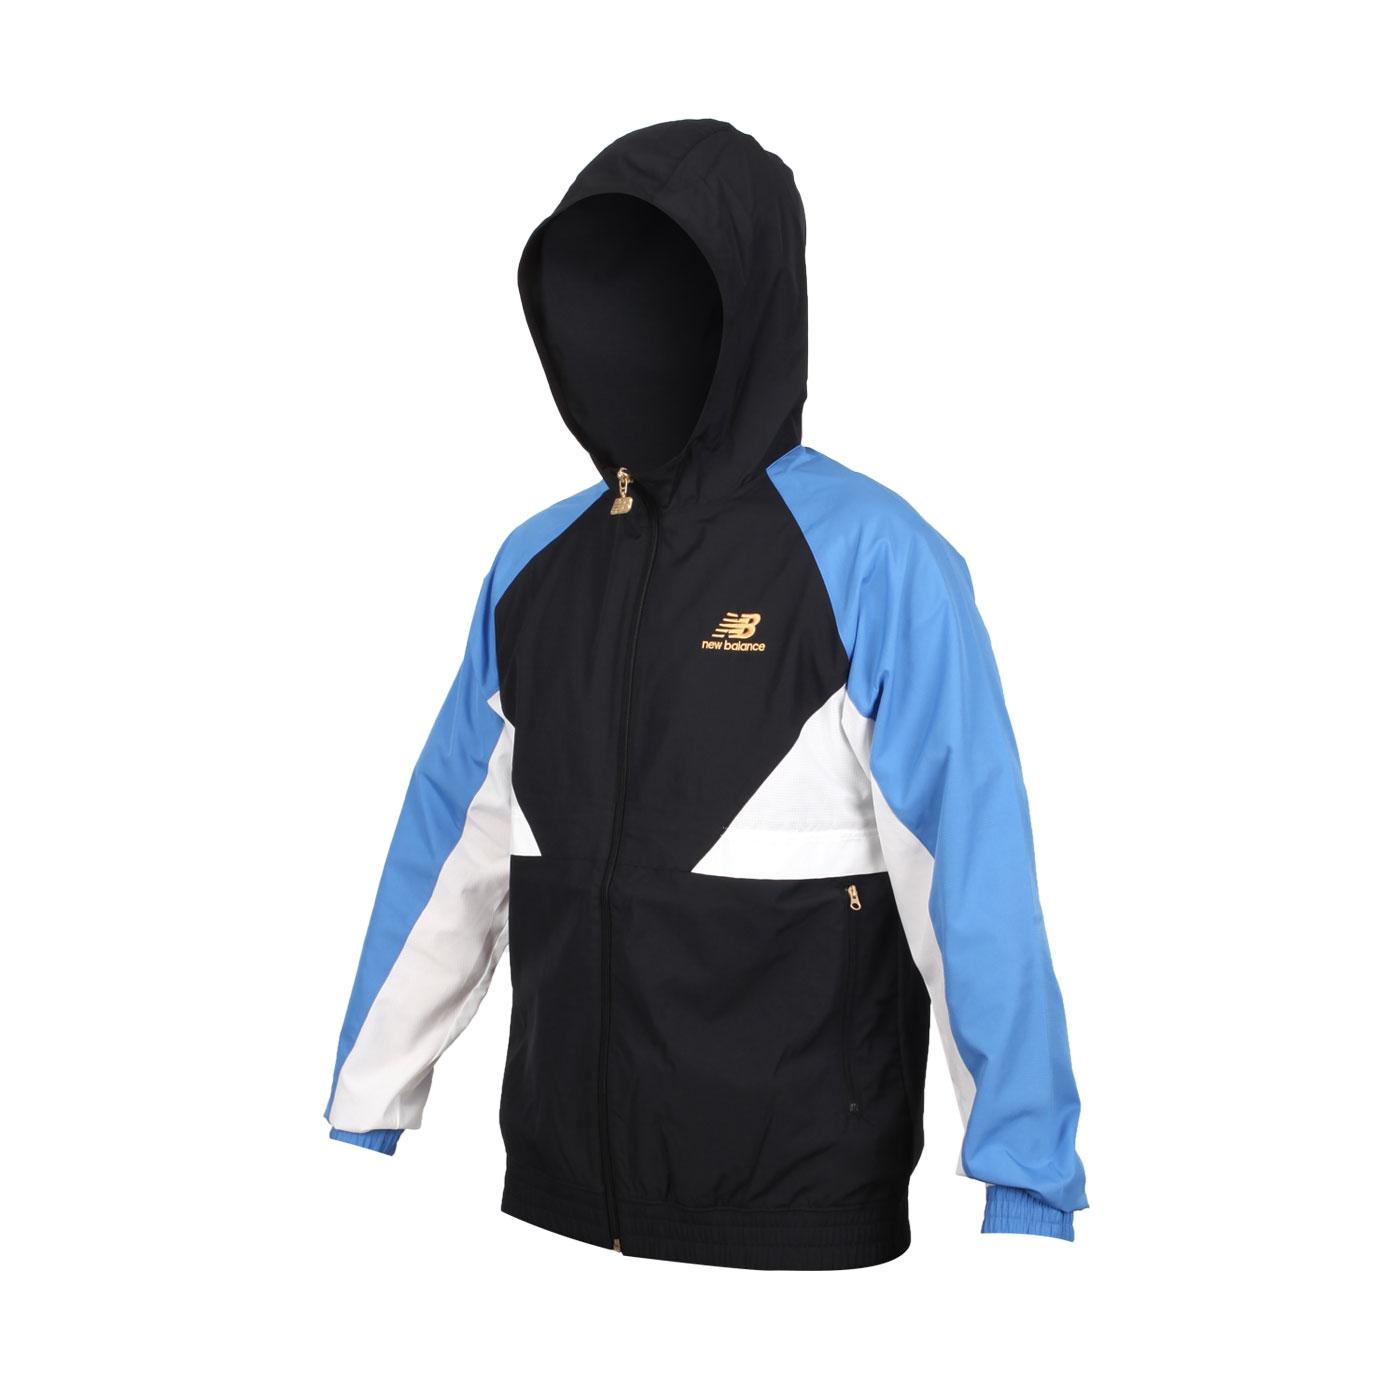 NEW BALANCE 男款連帽風衣外套 AMJ03502FCB - 黑白藍金